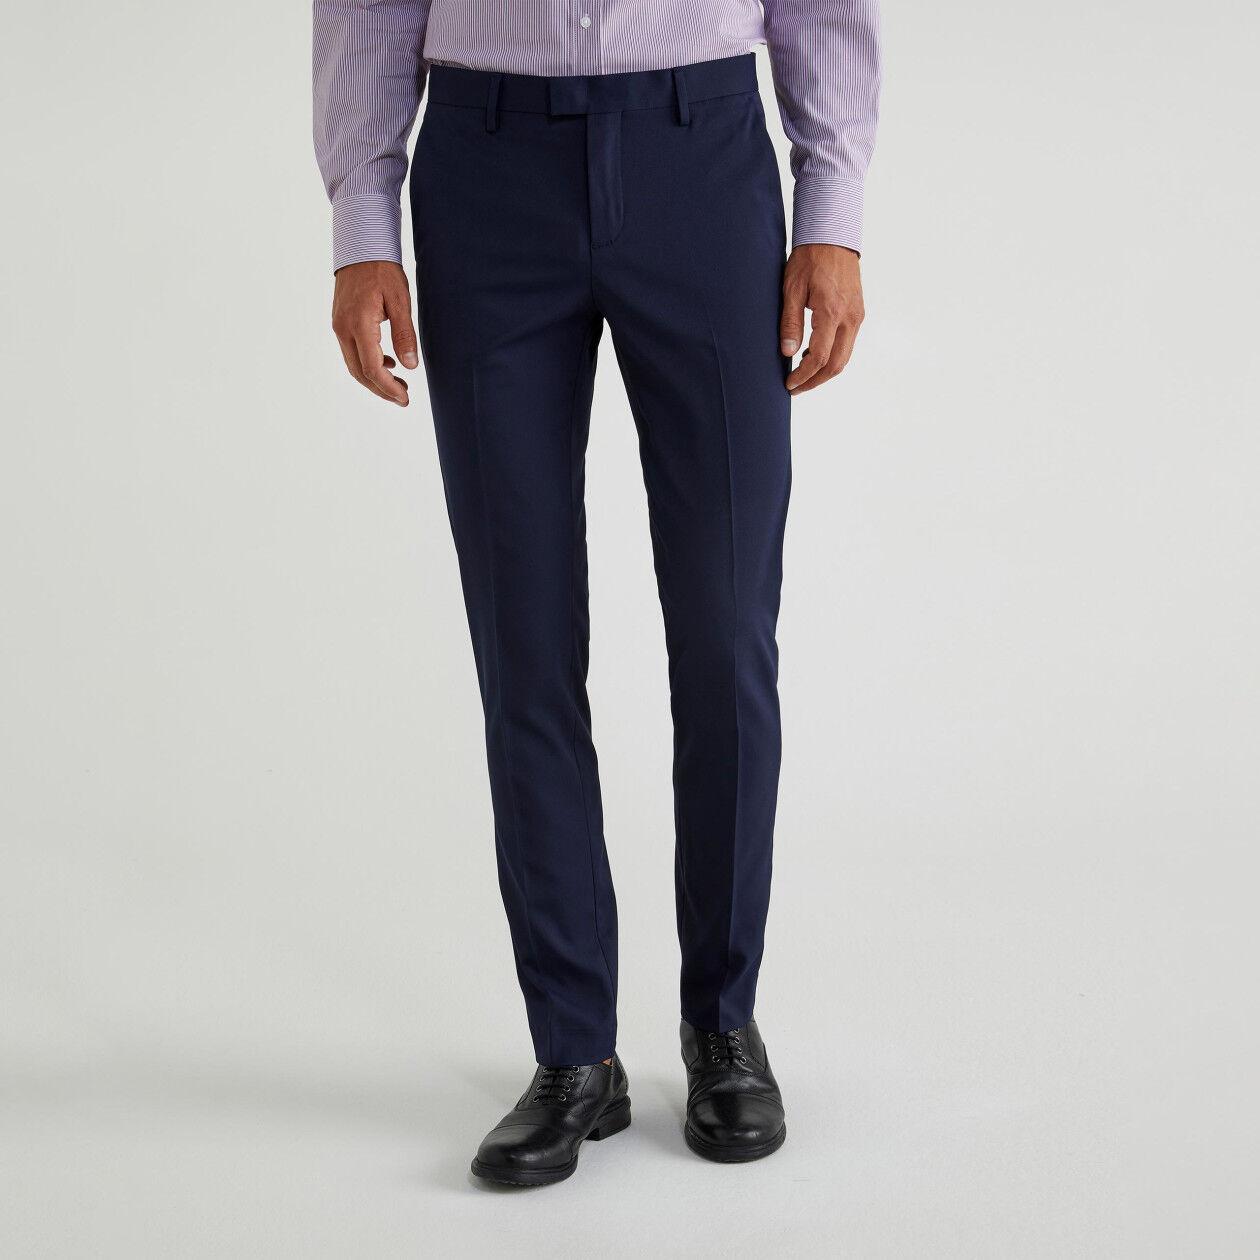 Pantalon coupe slim avec pli